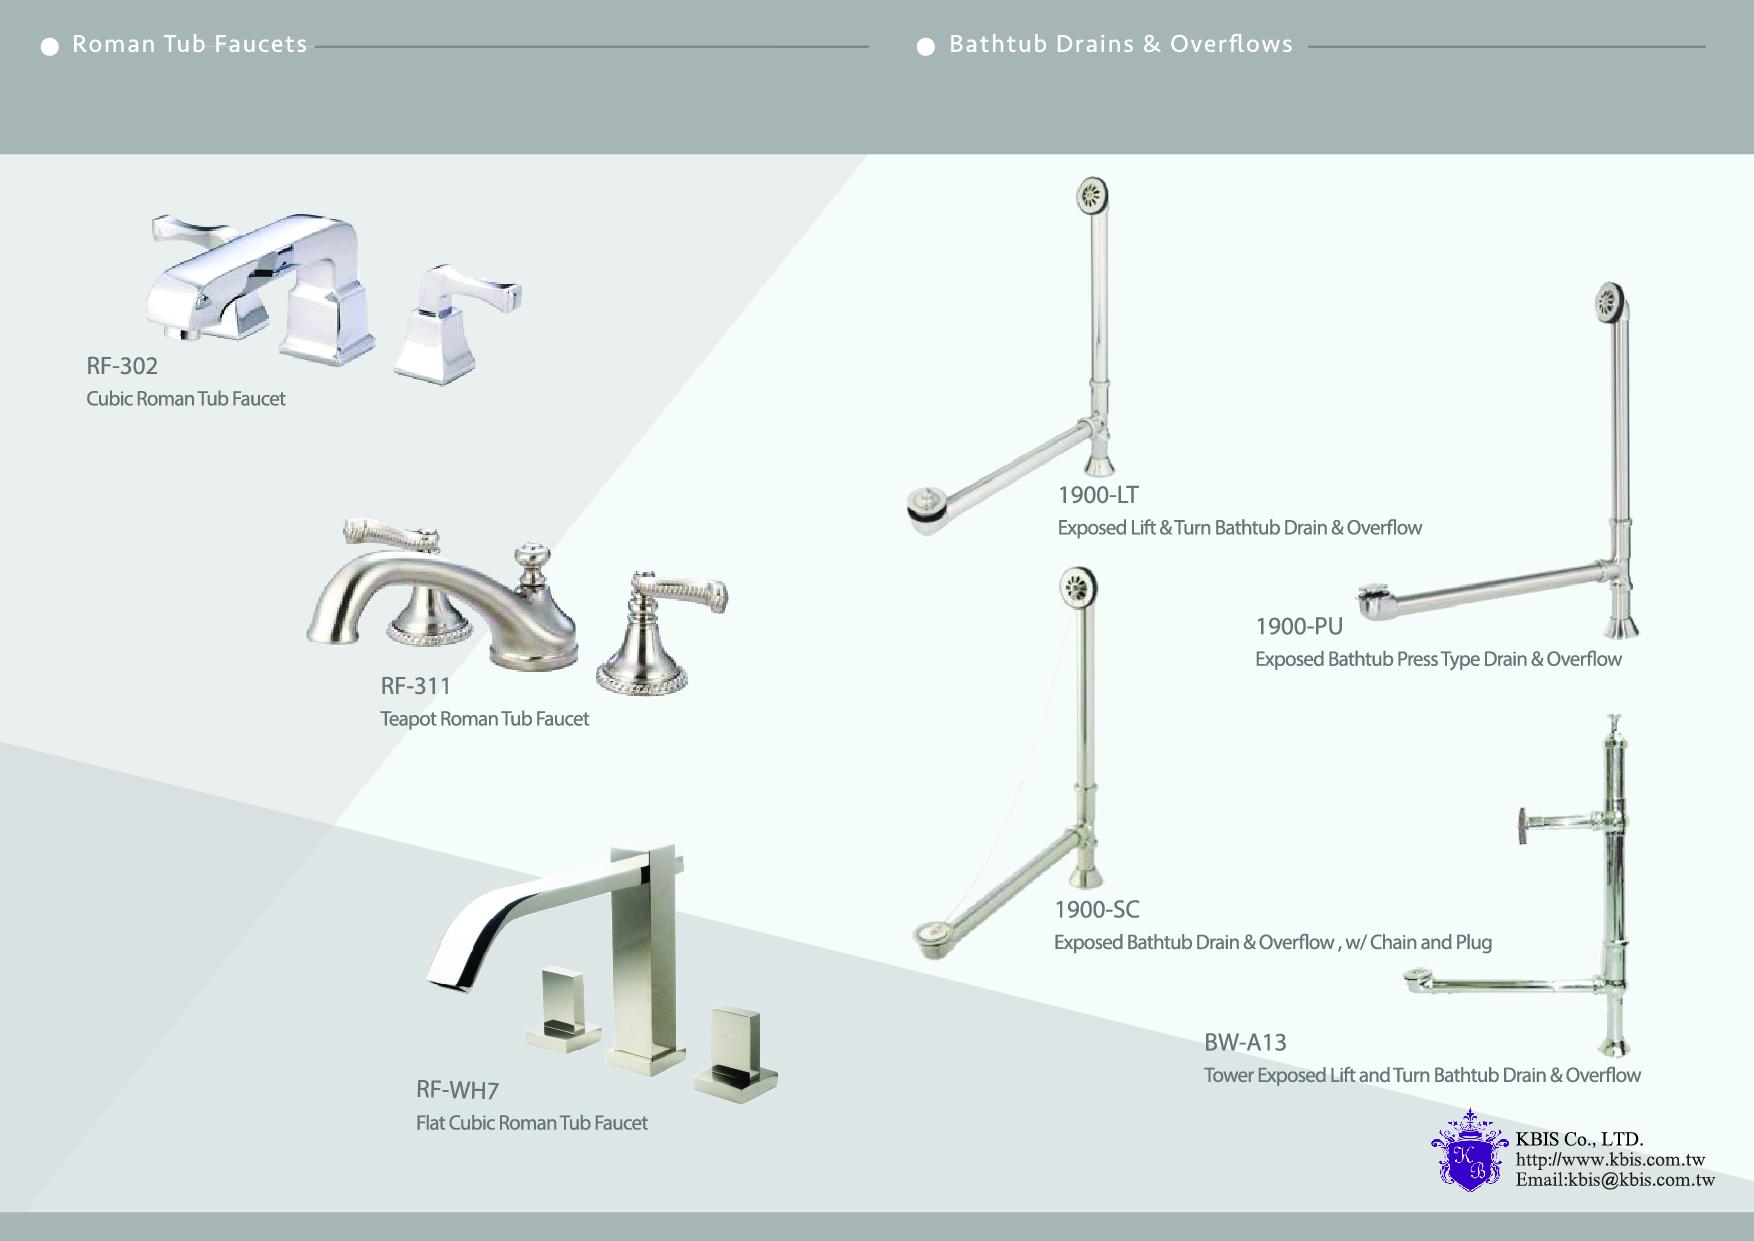 Roman Tub Faucets & Bathtub Drains & Overflows